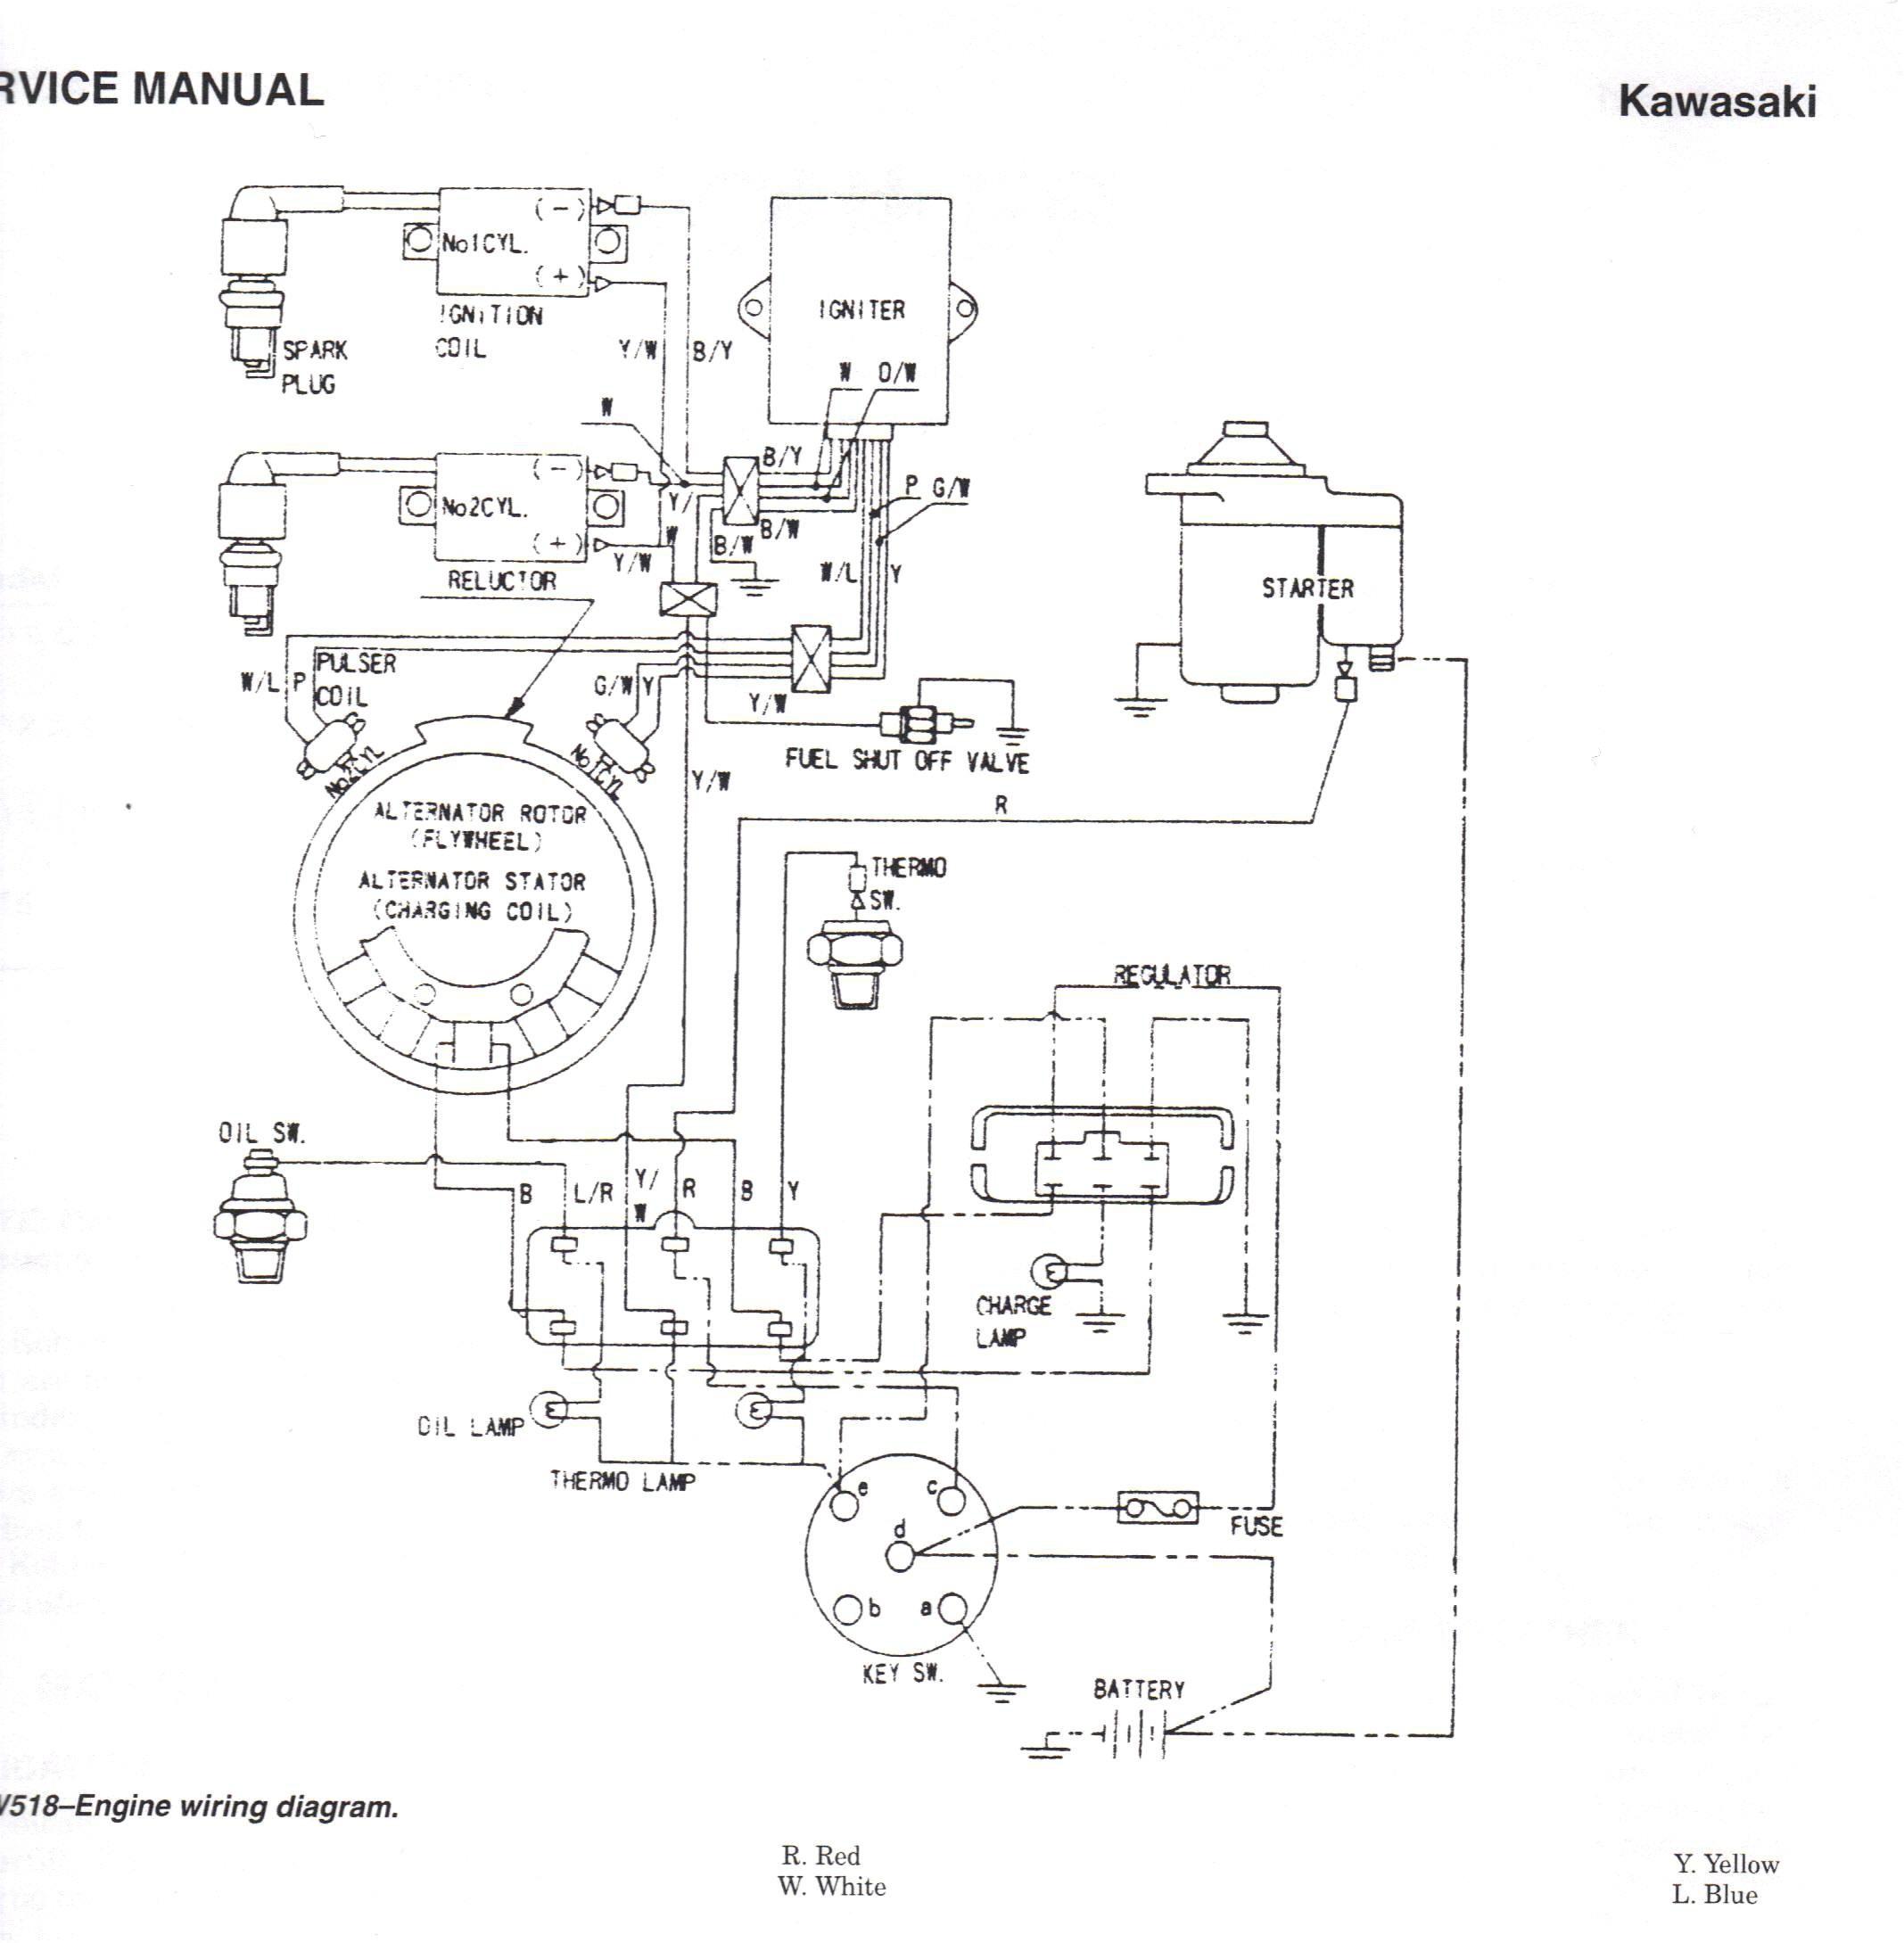 quad wiring diagram auto electrical wiring diagram gm internal regulator wiring diagram quad wiring diagram